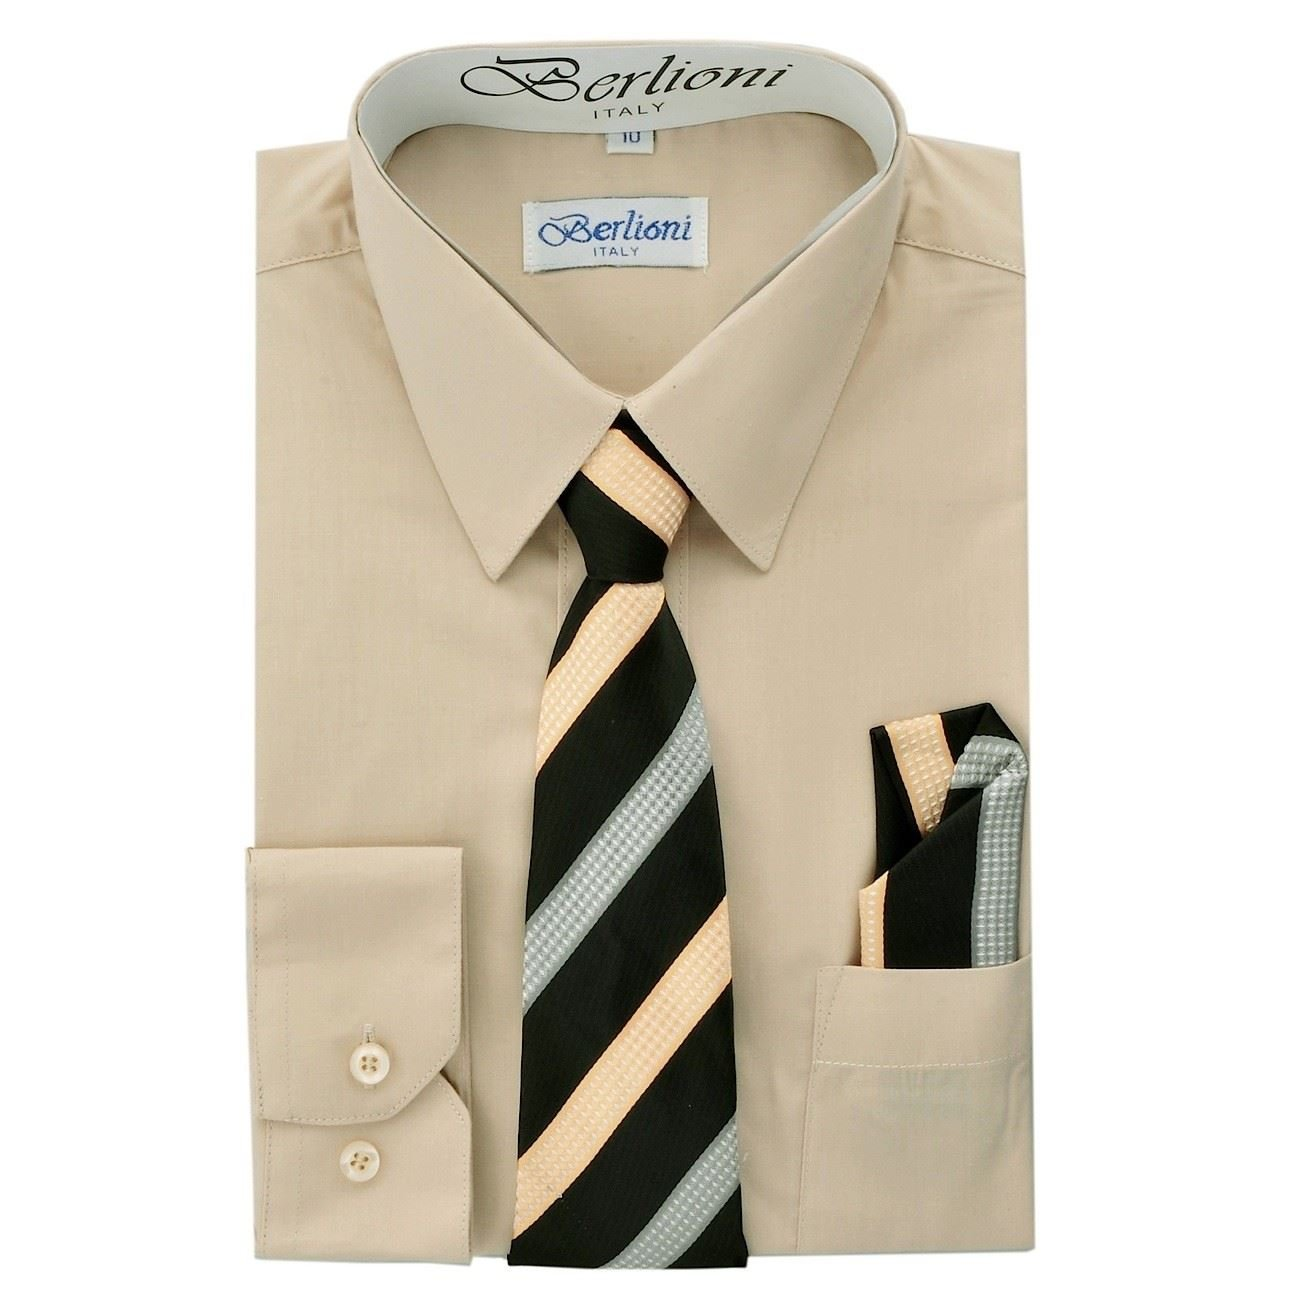 Berlioni Italy Kids Boys Dress Shirt with Tie & Hanky Long Sleeves Khaki